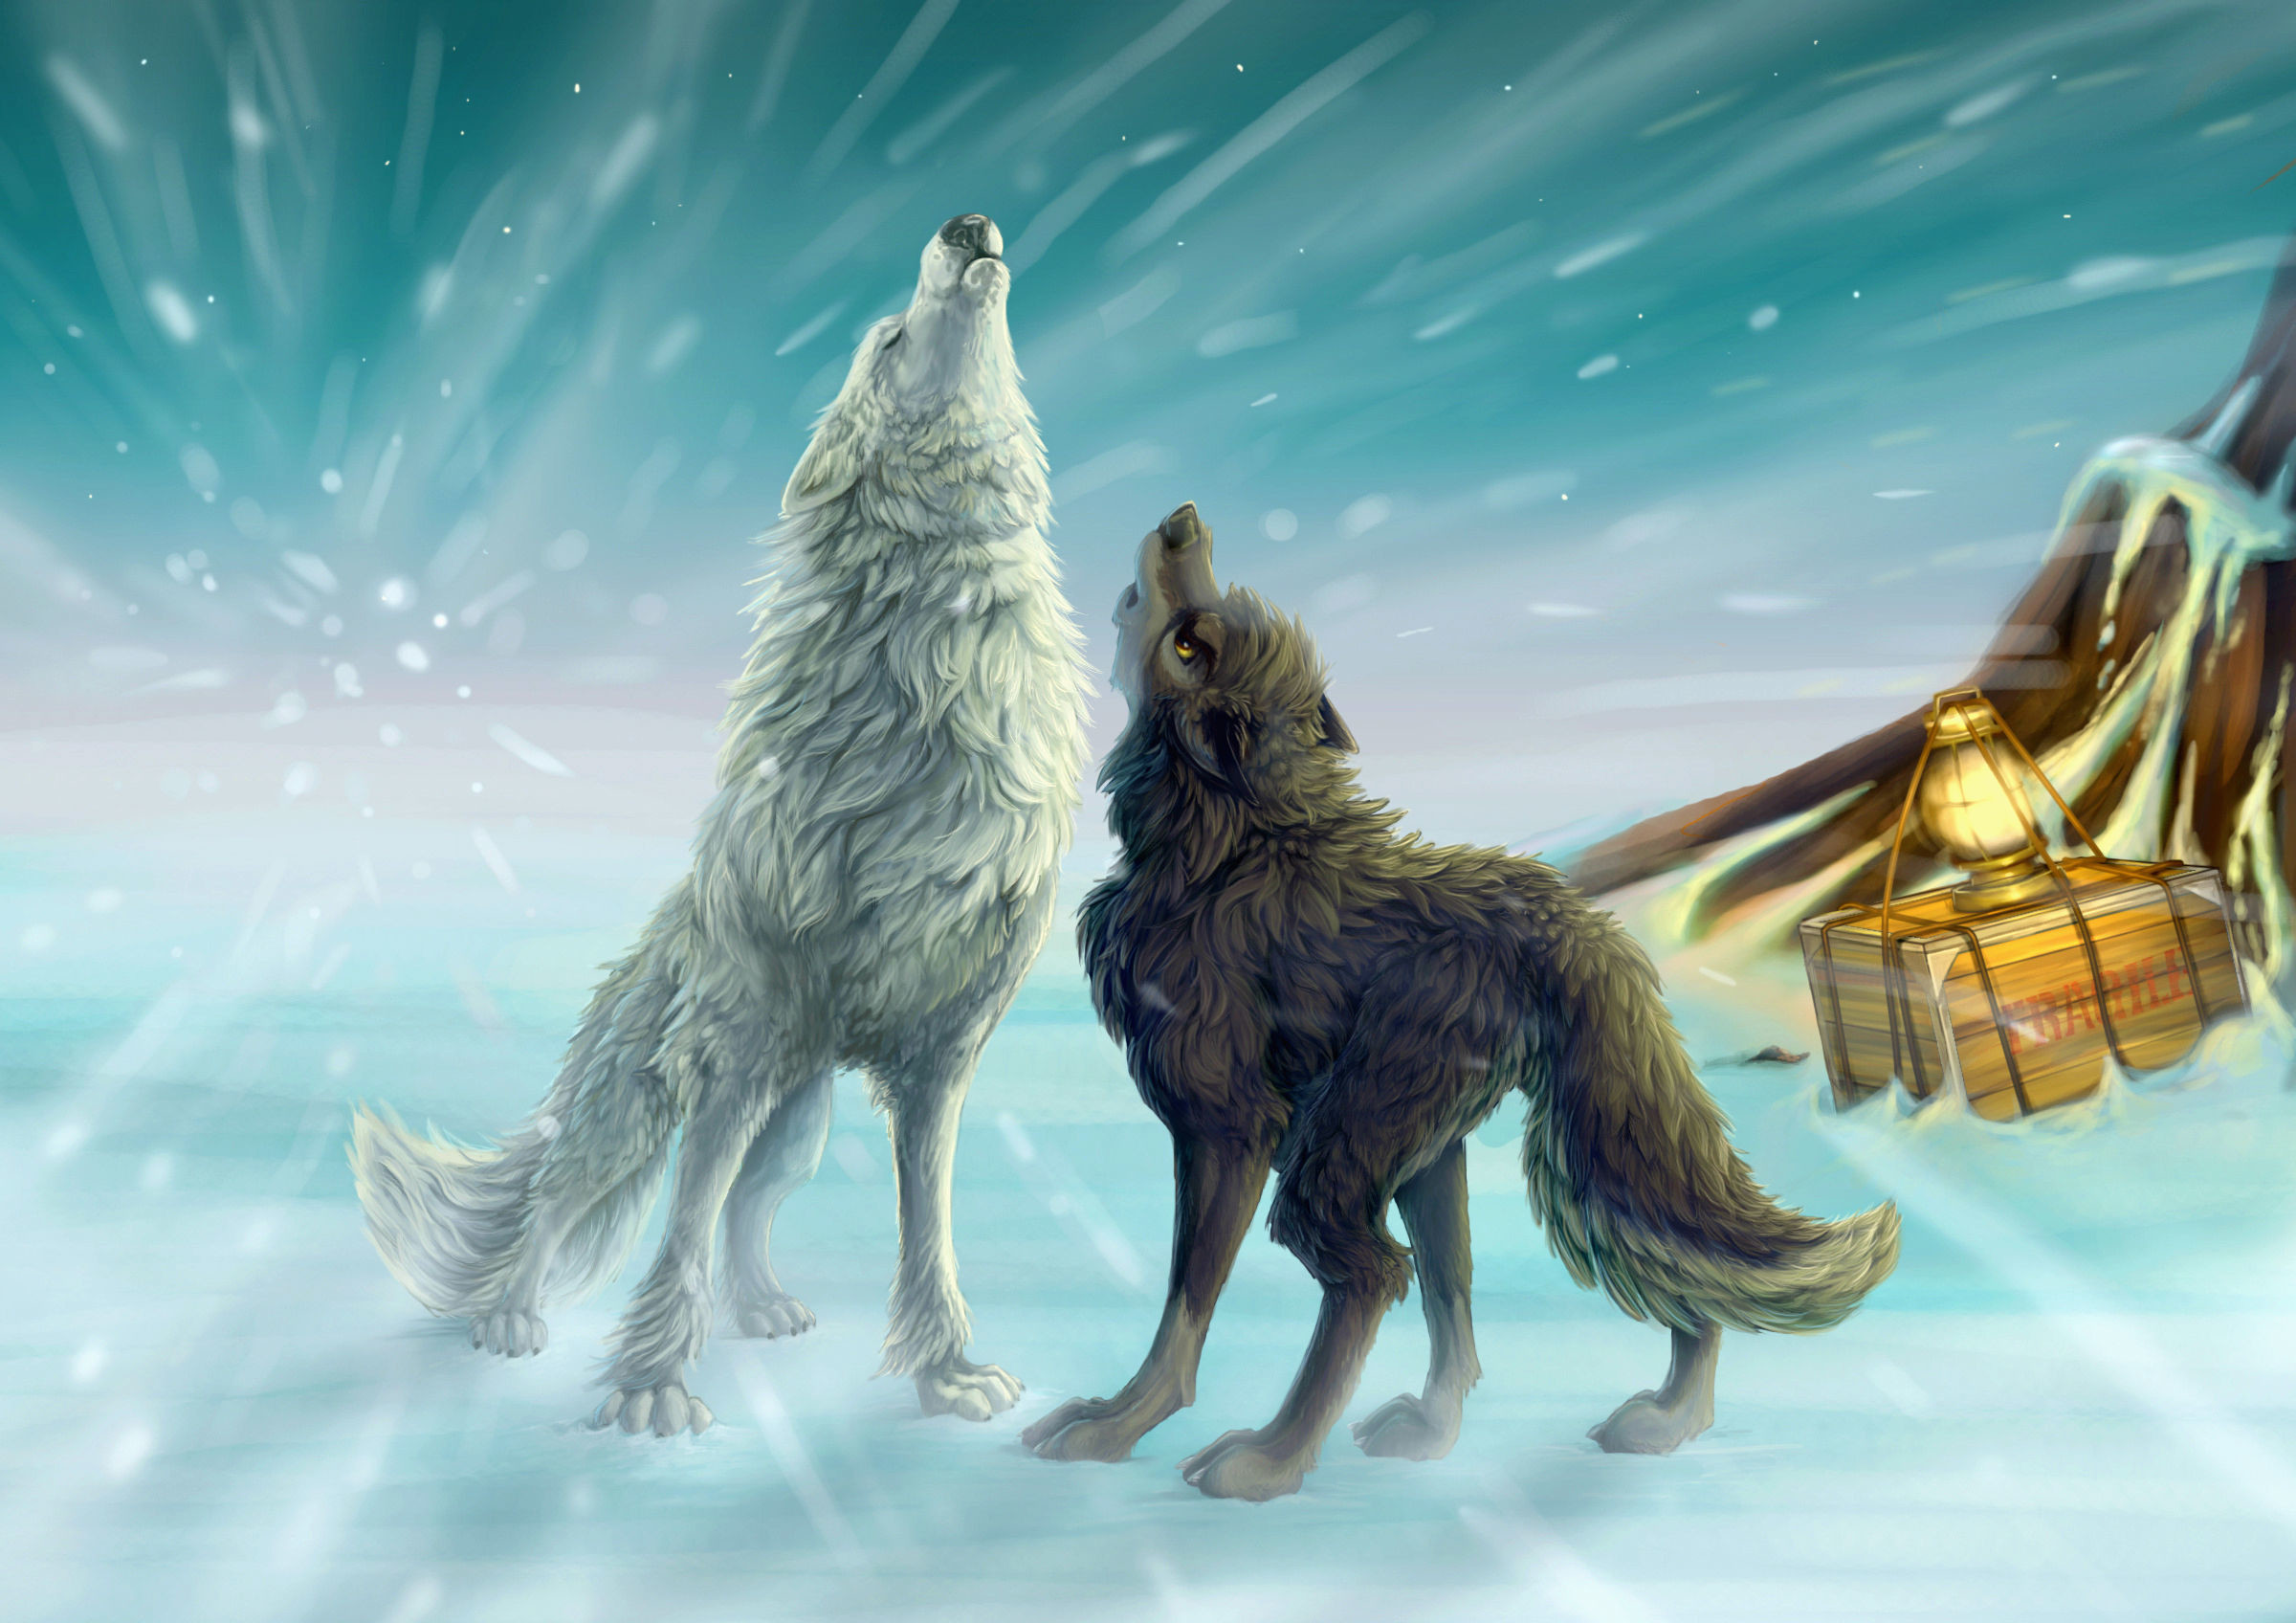 anime wolf wallpapers desktop cool anime wolf pics desktop hd anime .